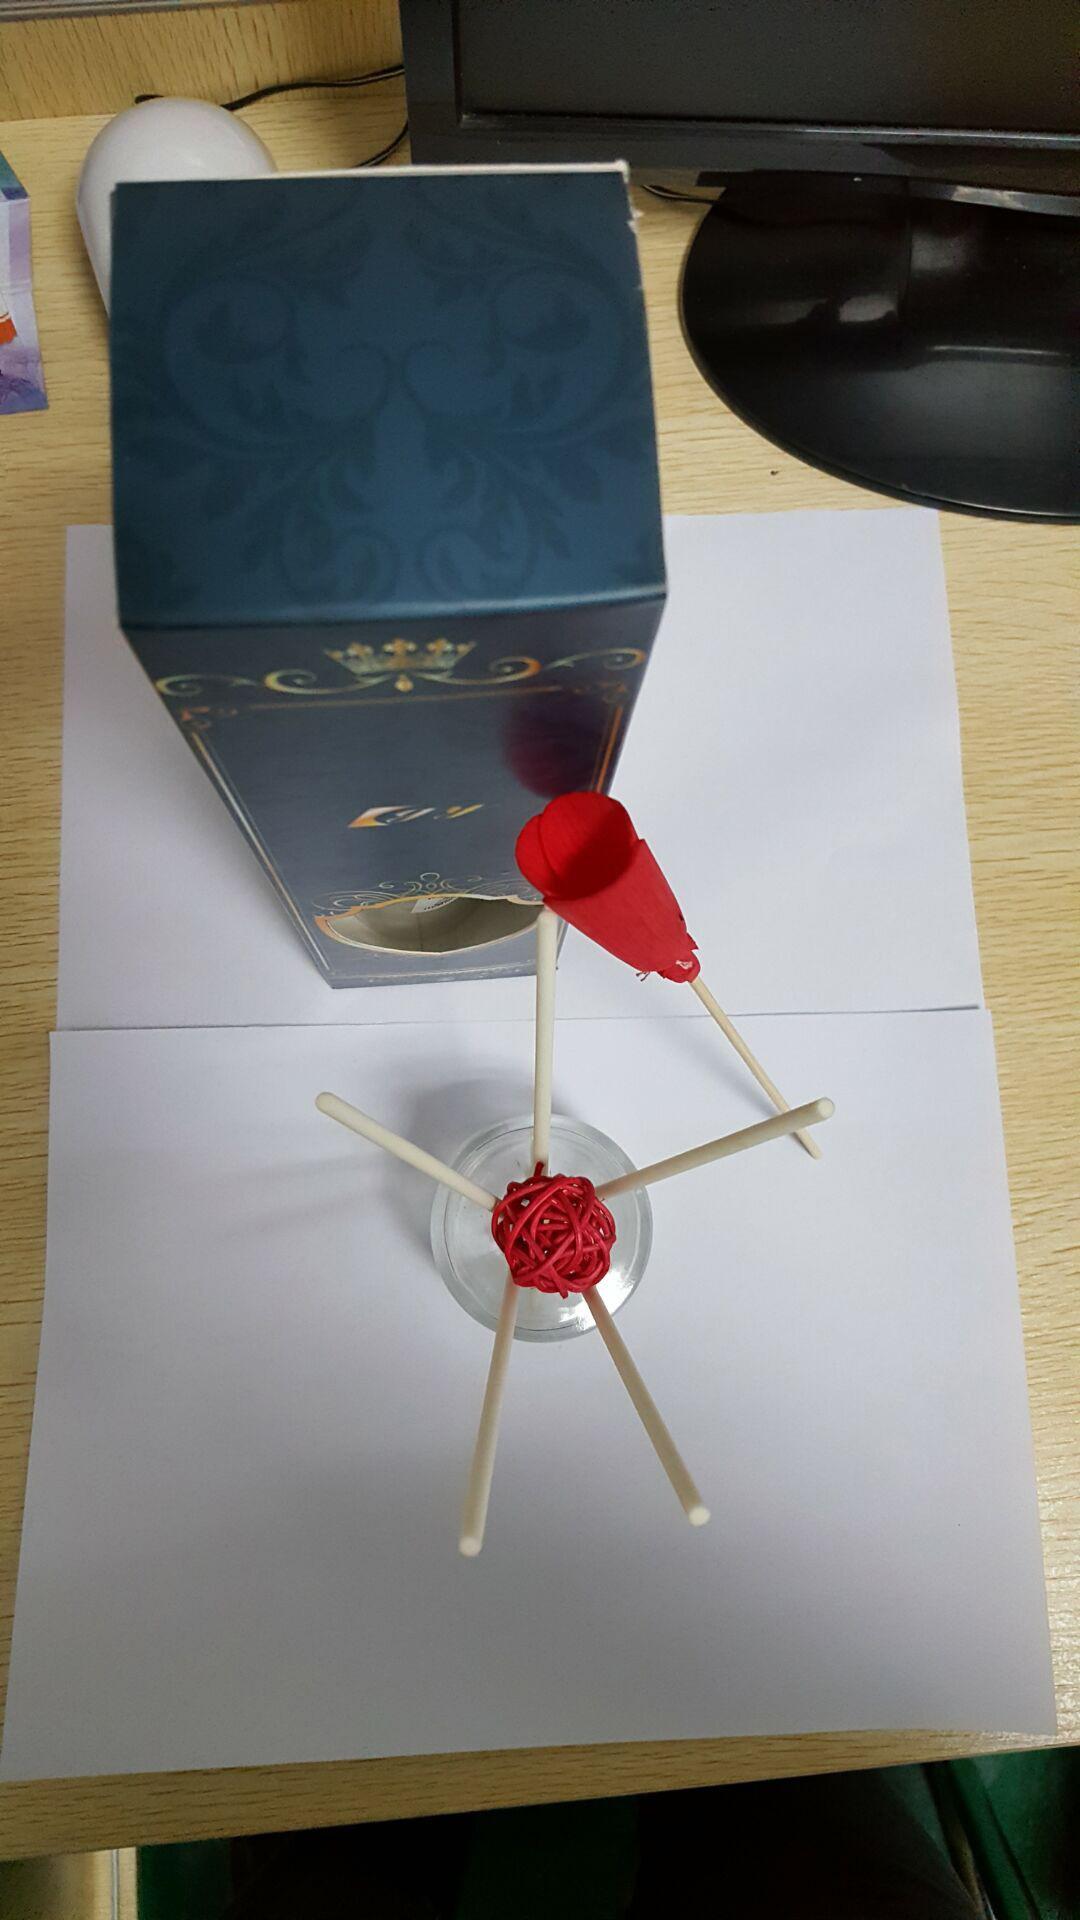 Fragrance Spread Rod, Diffuser Reed Sticks